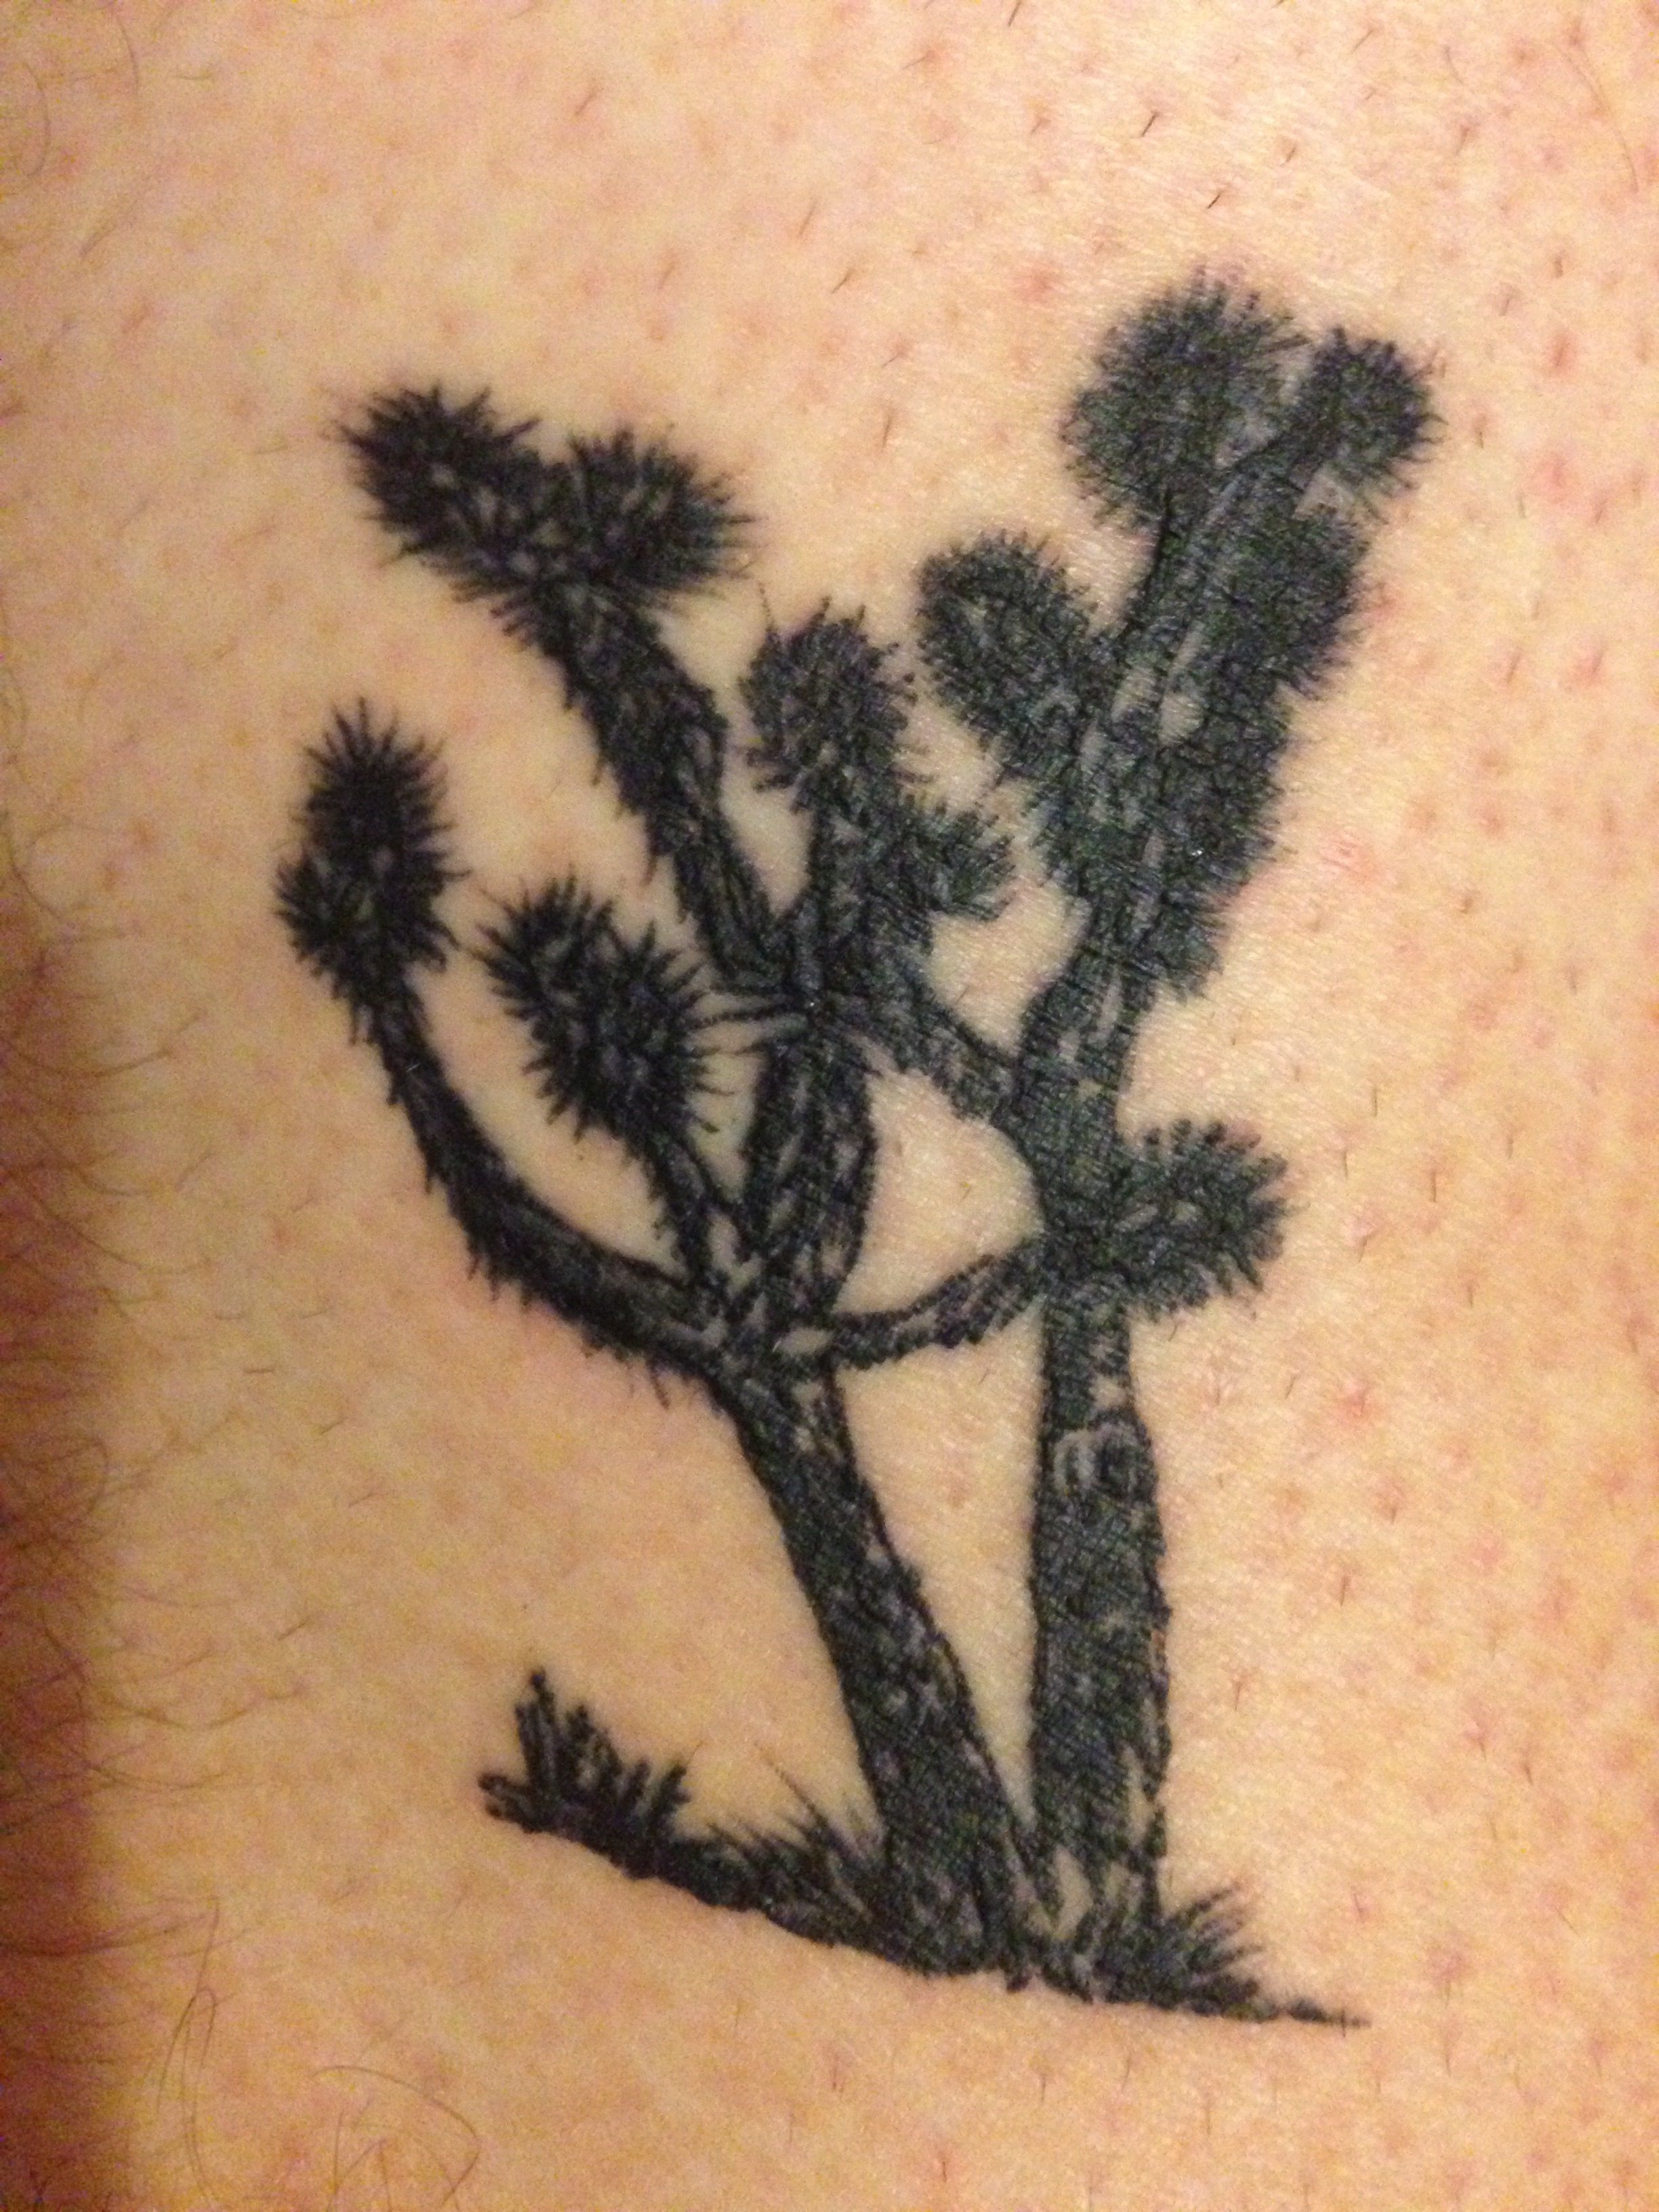 Joshua Tree Tattoo : joshua, tattoo, Joshua, Tattoo, Holiday, California., Liquid, Yucca, Valley, Tattoo,, Tattoos,, World, Famous